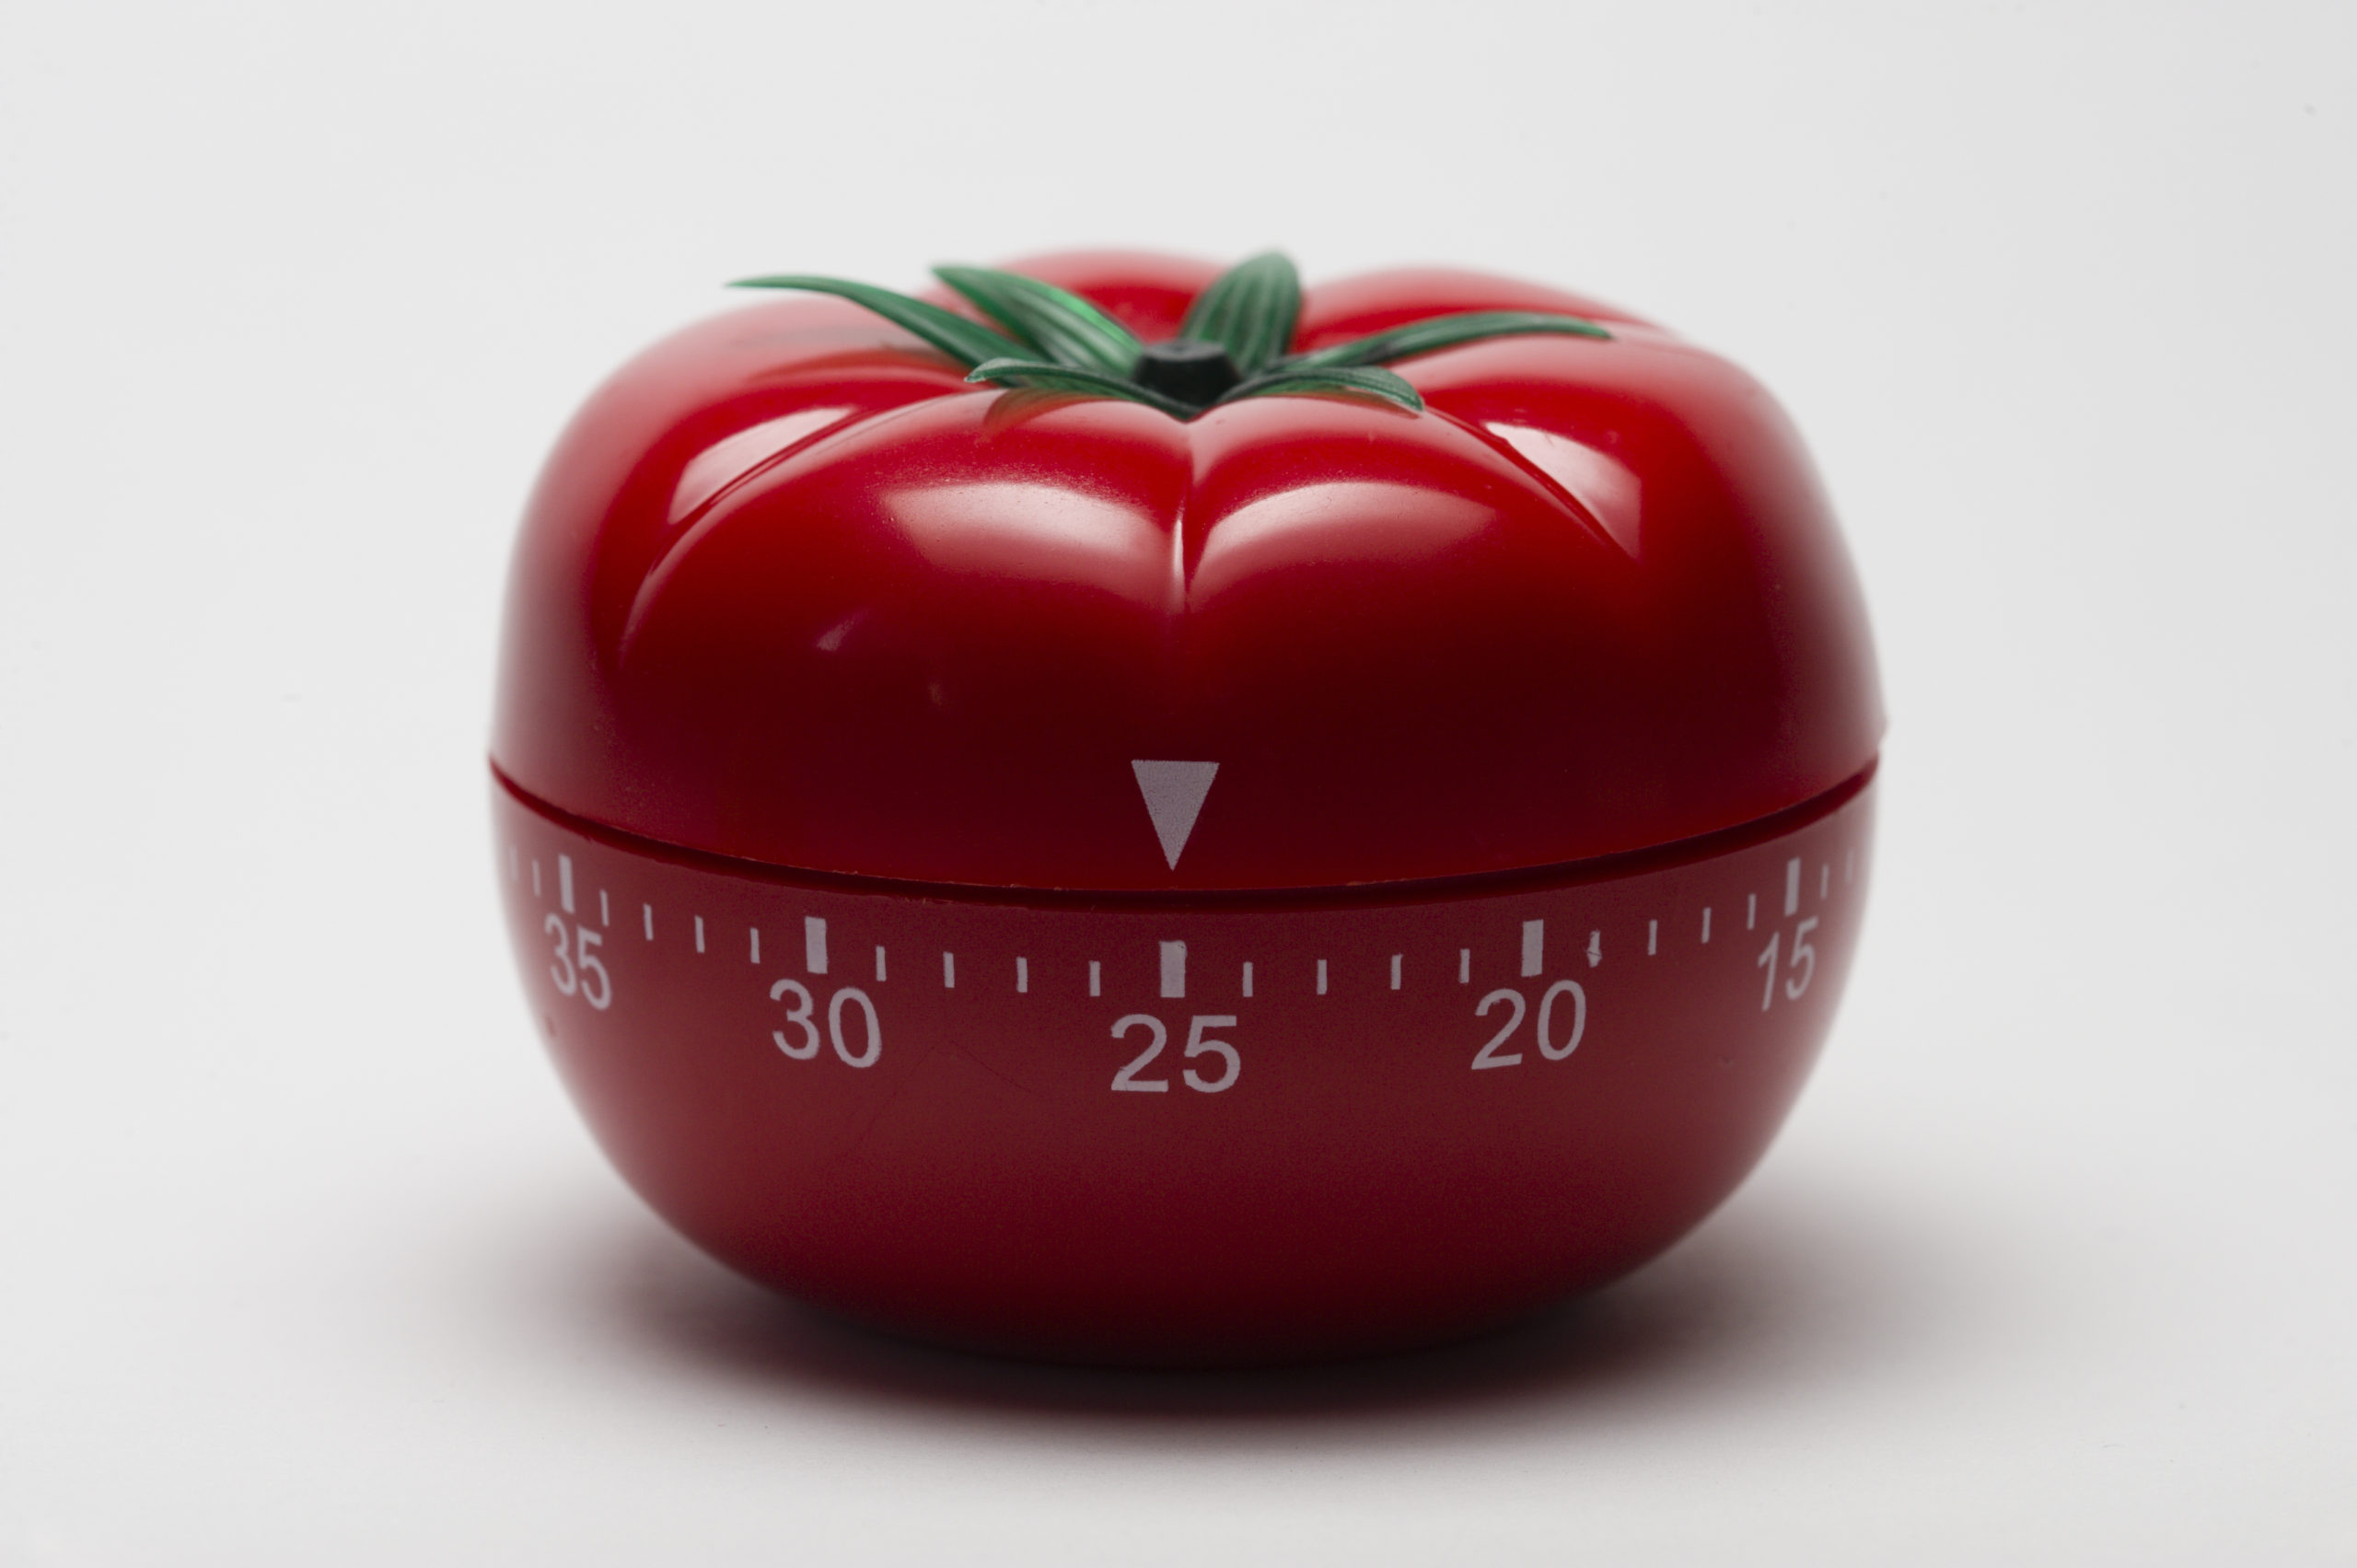 pomodore-technik, fokuszeit, focustime, timeboxing